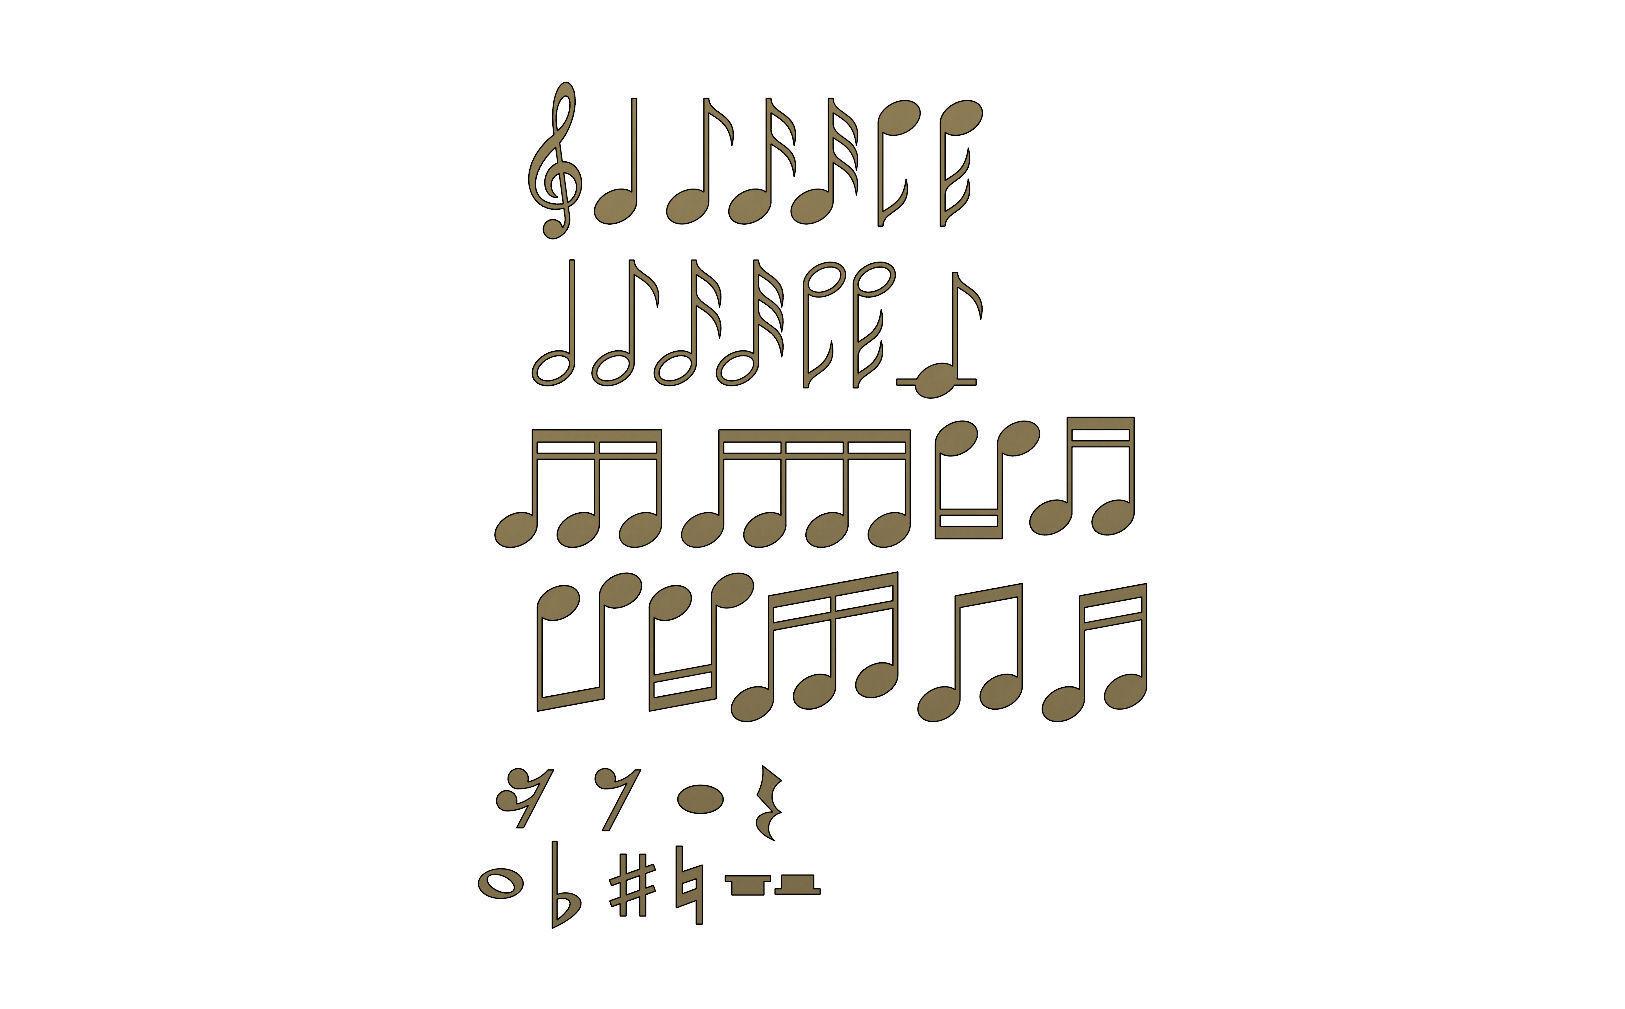 Musical notes symbols characters